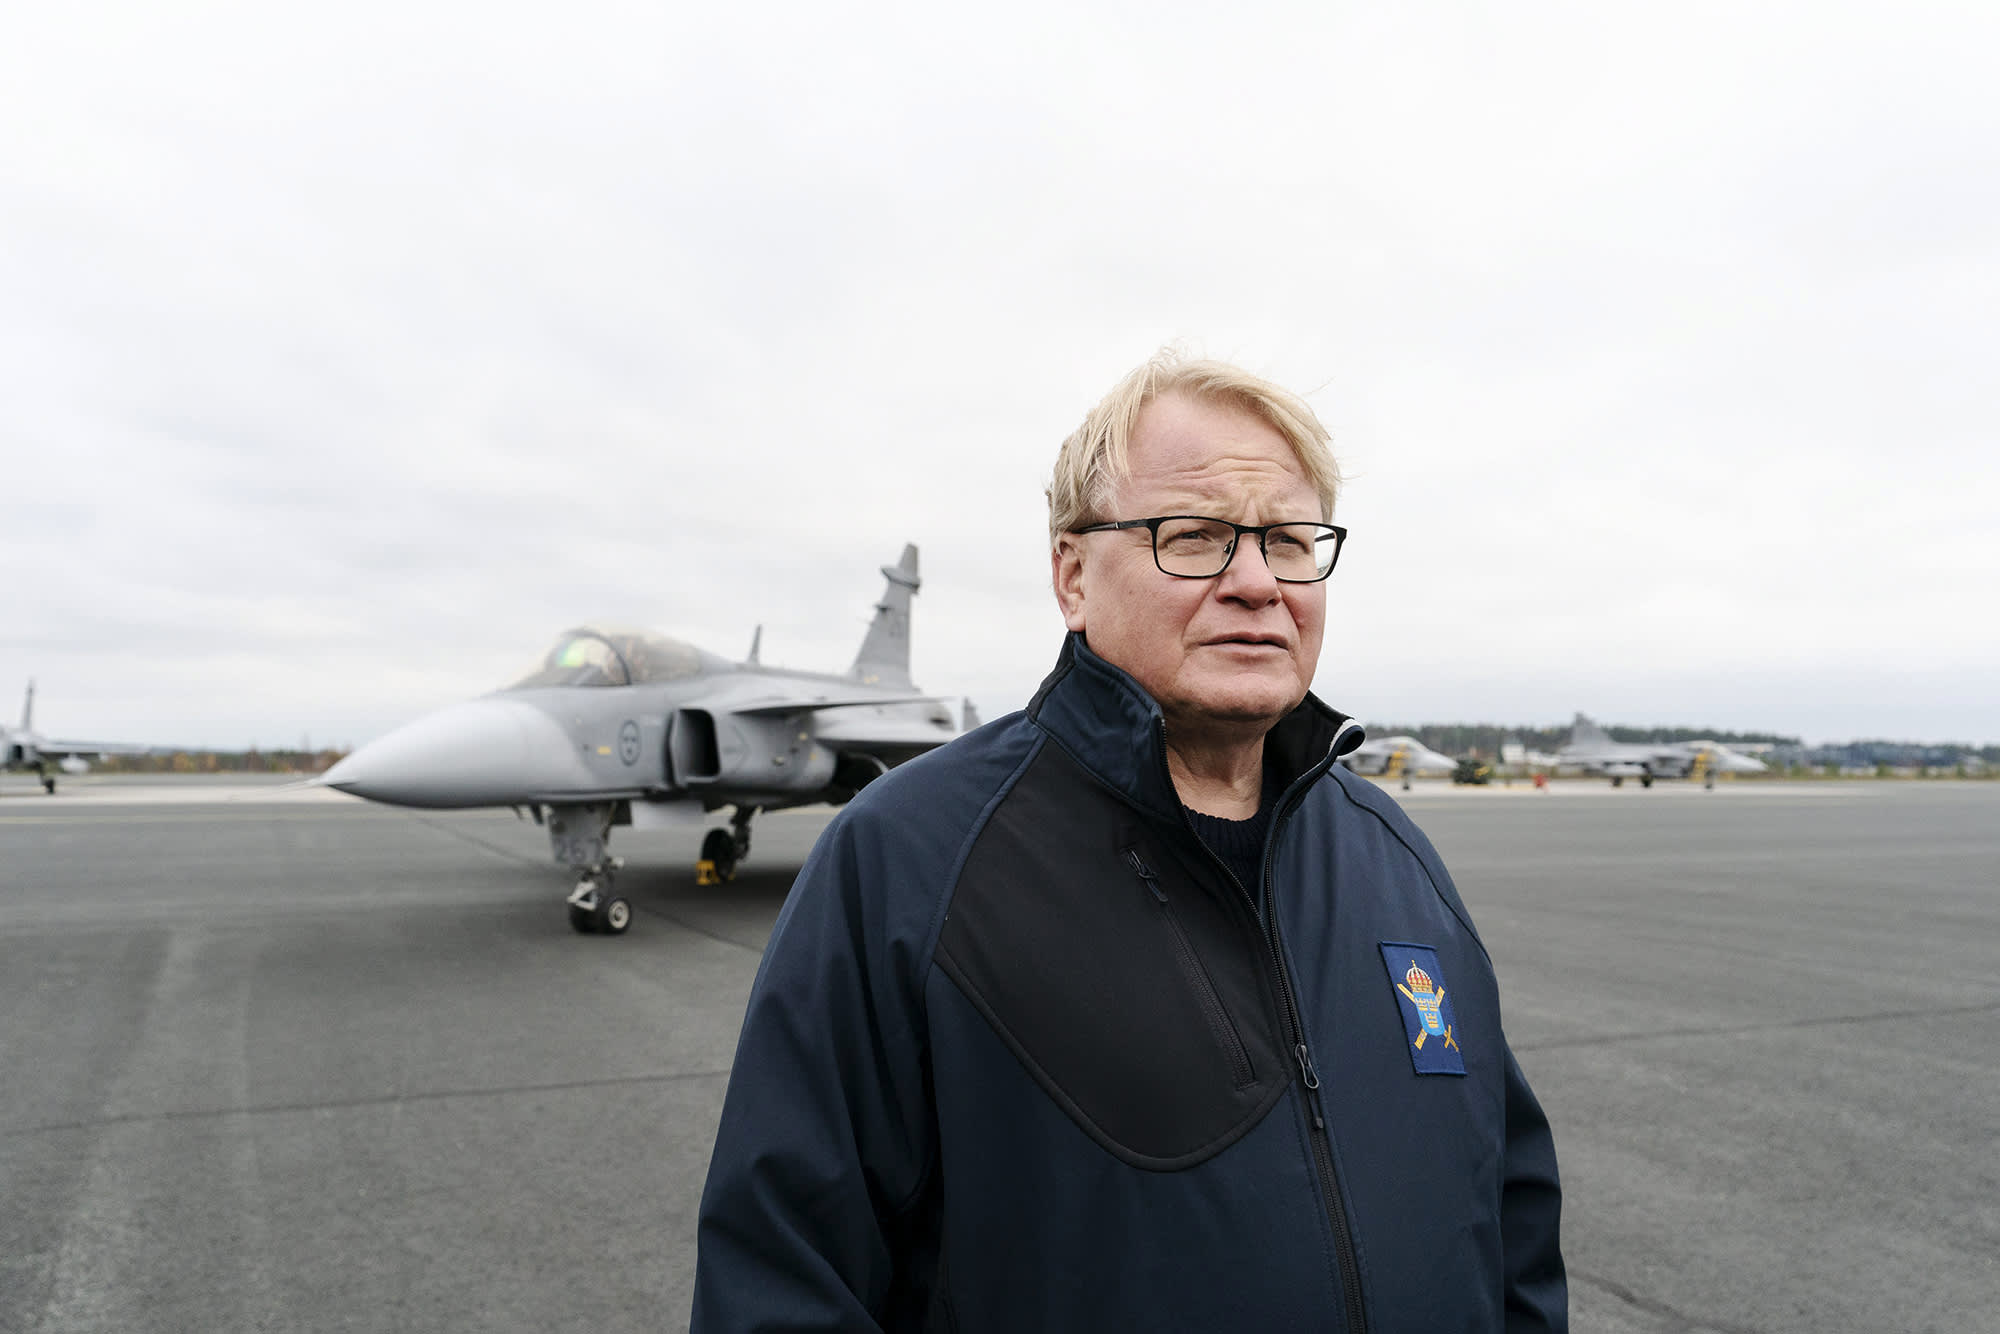 Kuvassa on Ruotsin puolustusministeri Peter Hultqvist.